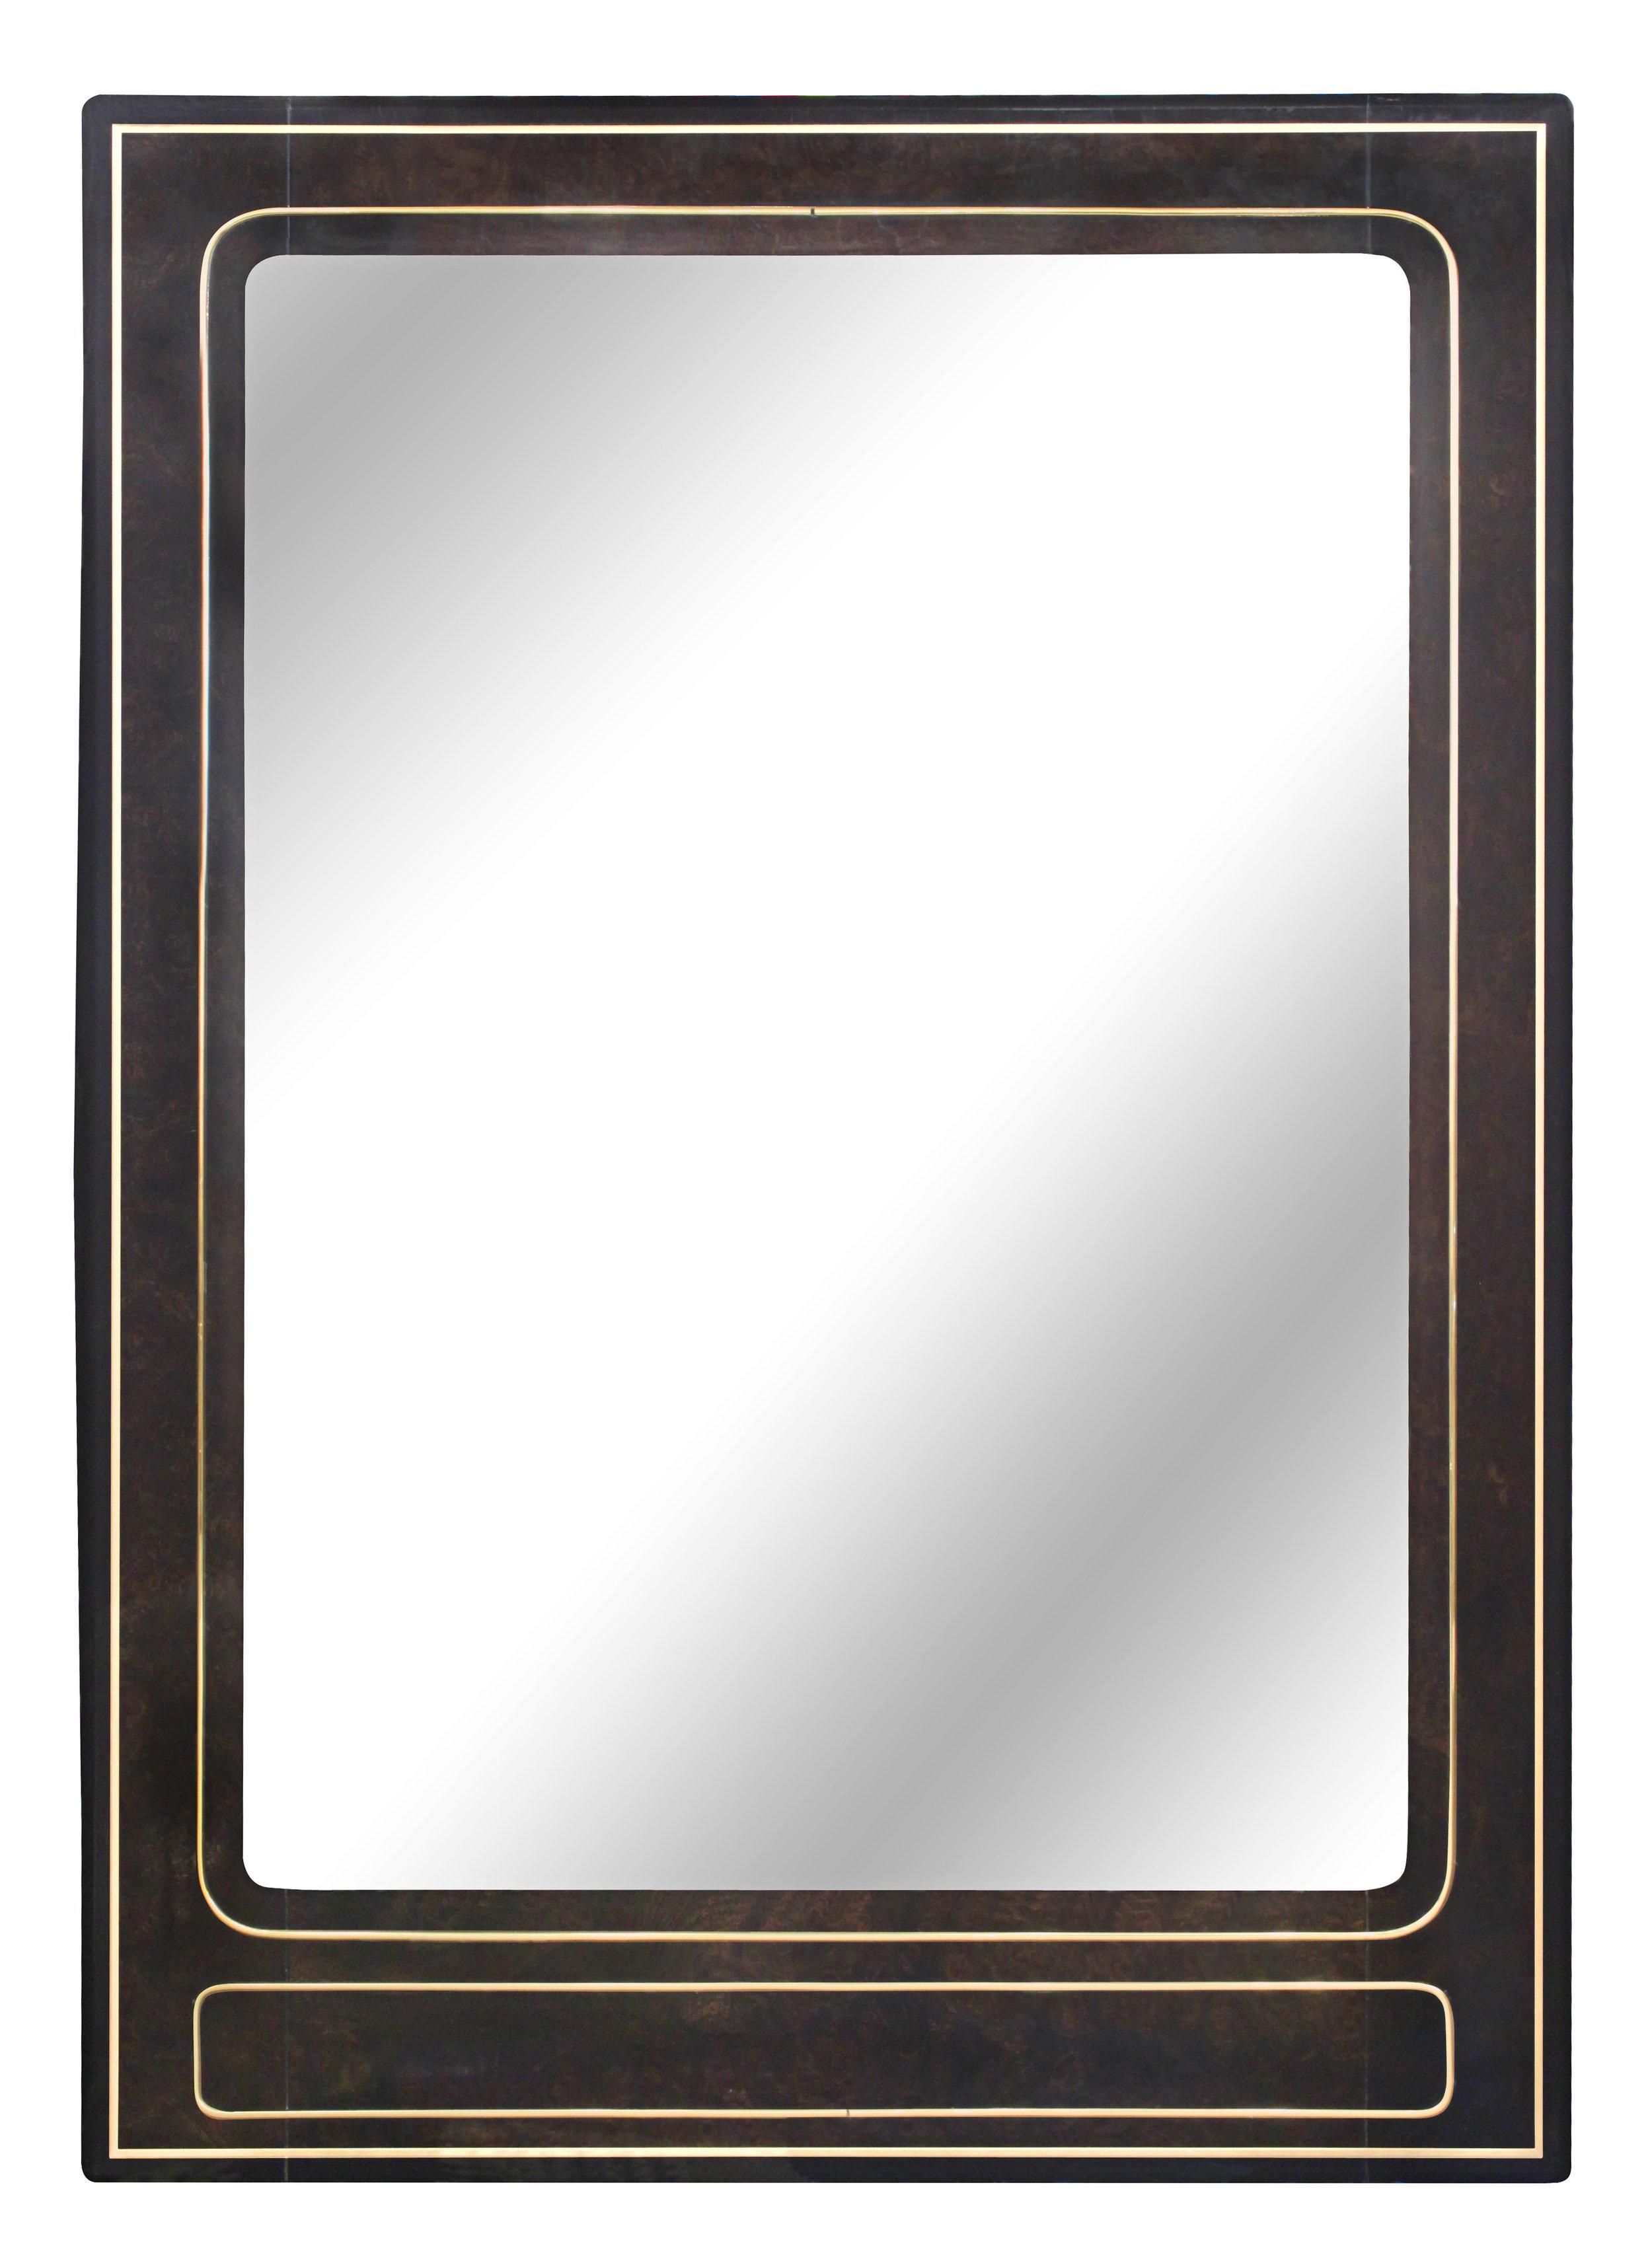 Romweber 55 drk walnut+brass inly mirror193 hires.jpg